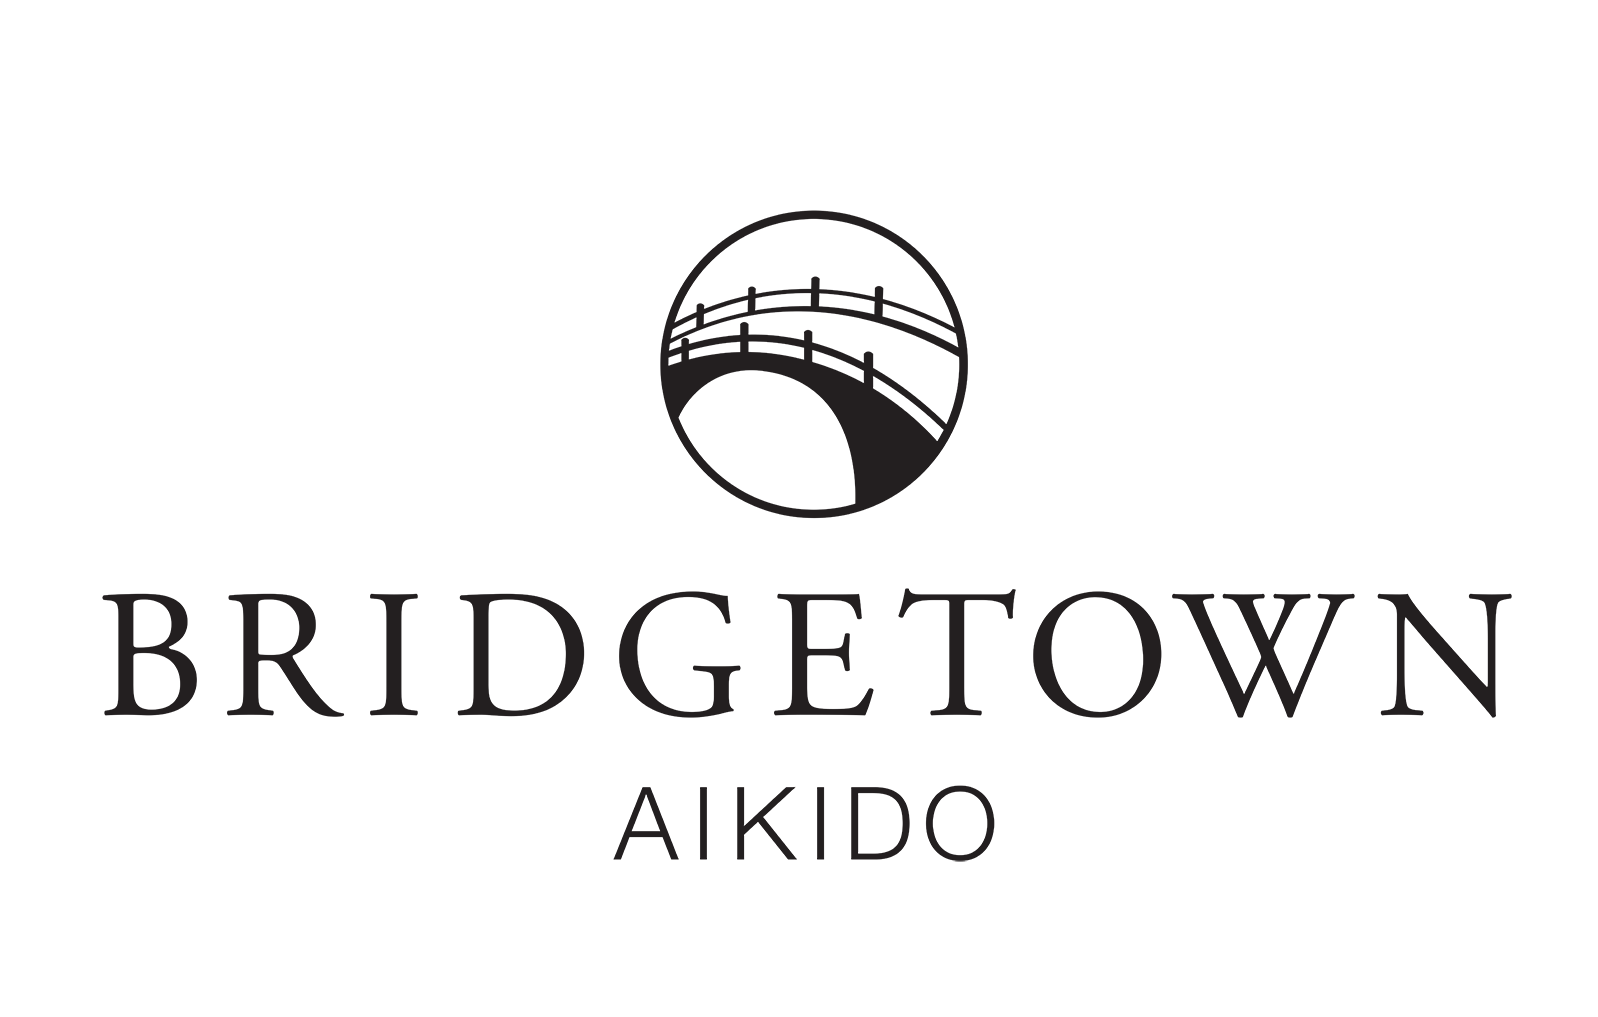 Bridgetown Aikido